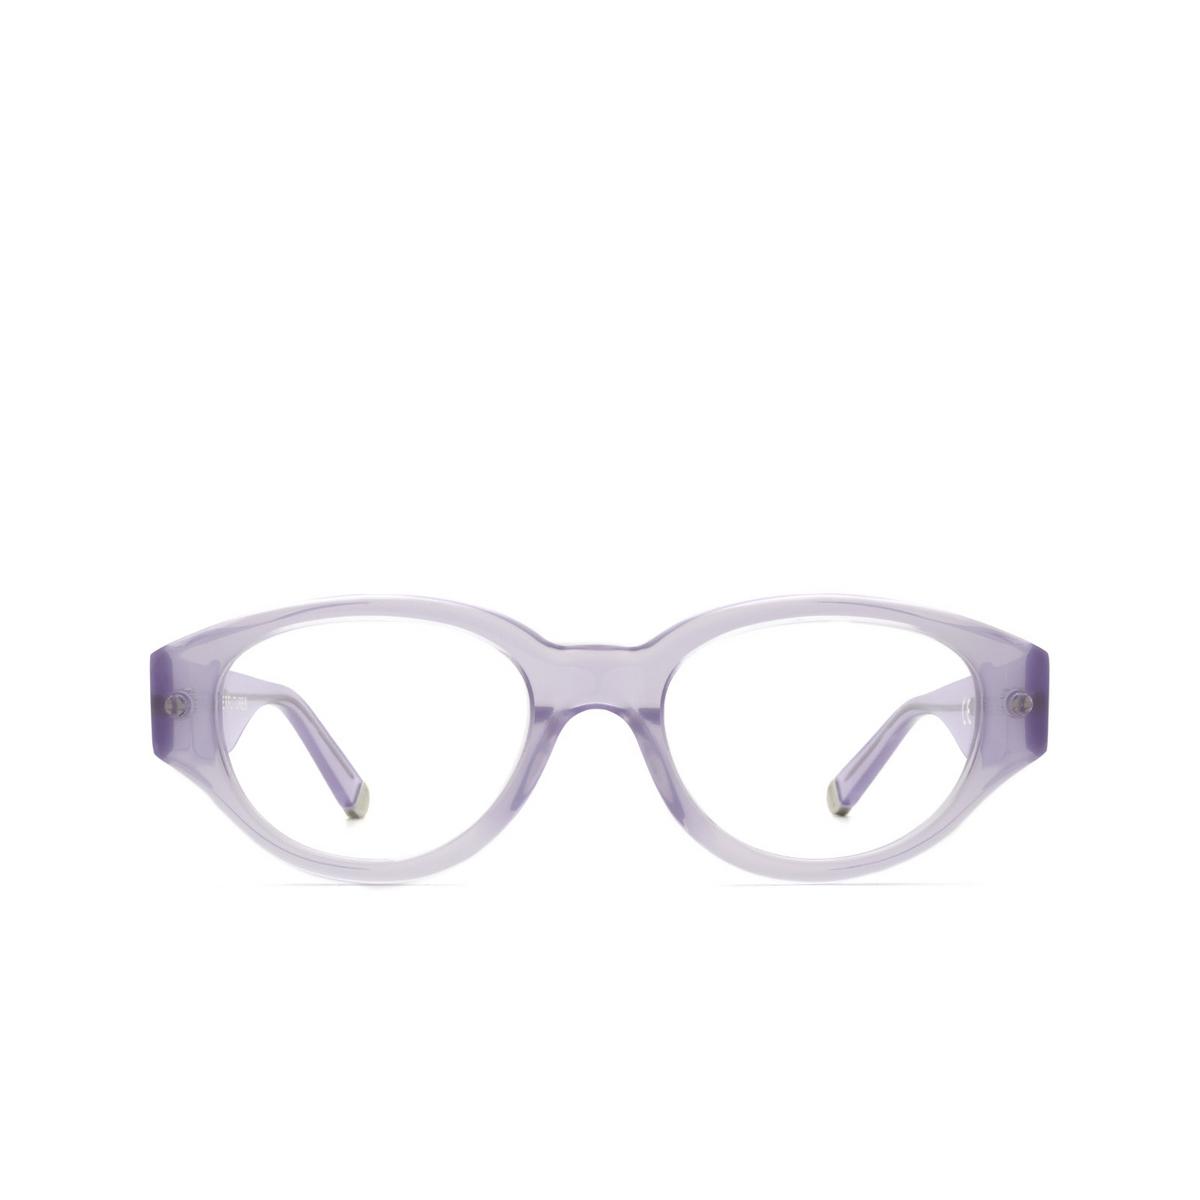 Retrosuperfuture® Oval Eyeglasses: Drew Mama Optical color Dea 7JA - front view.